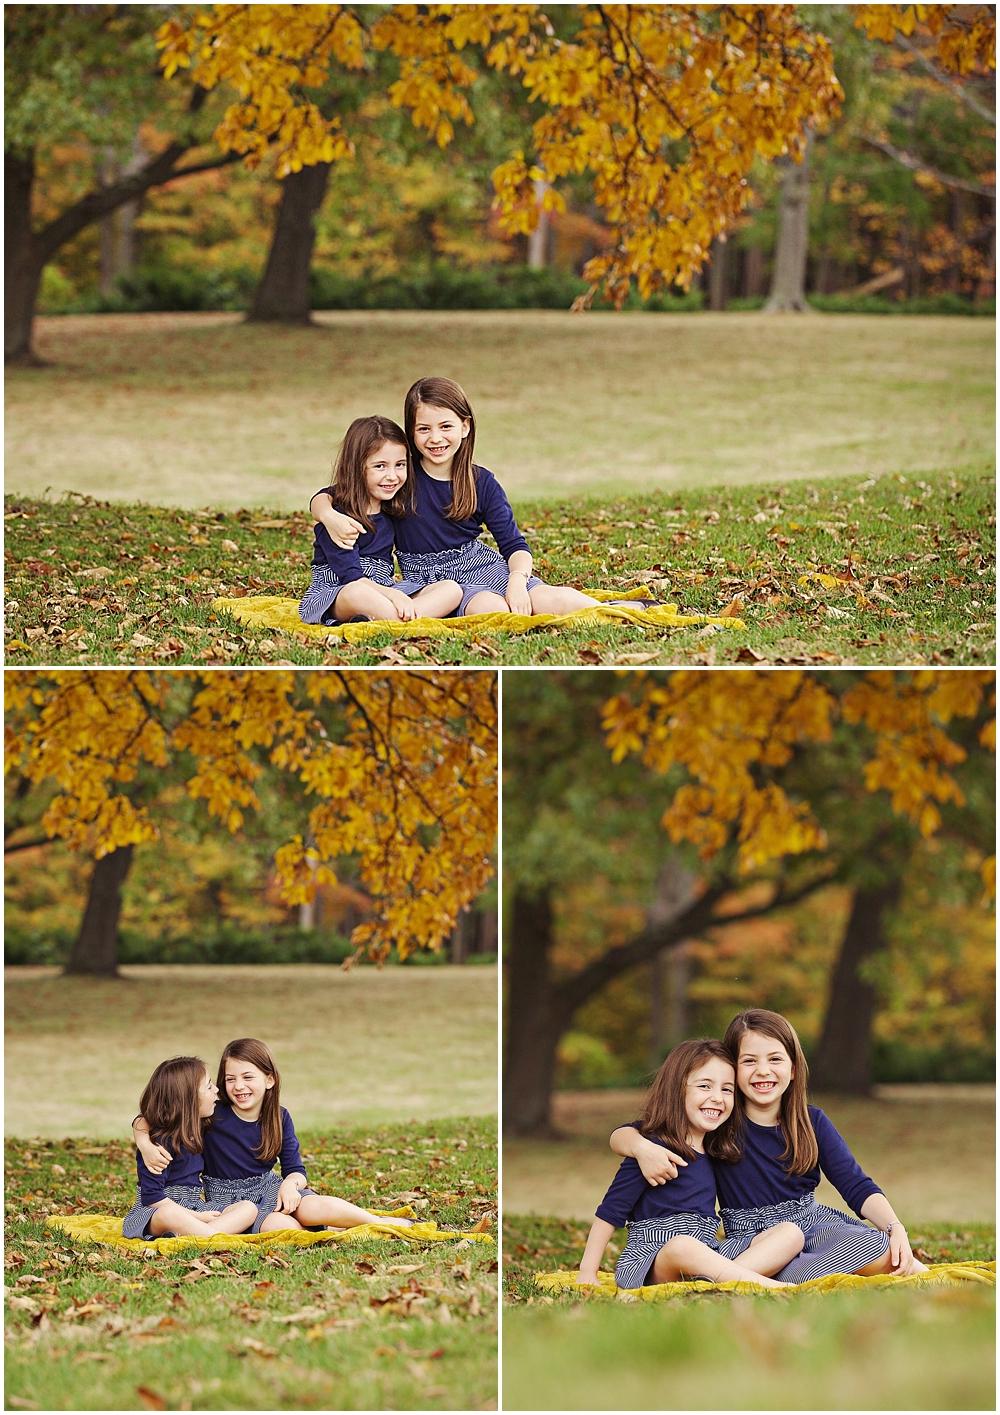 boston childrens portrait photographer